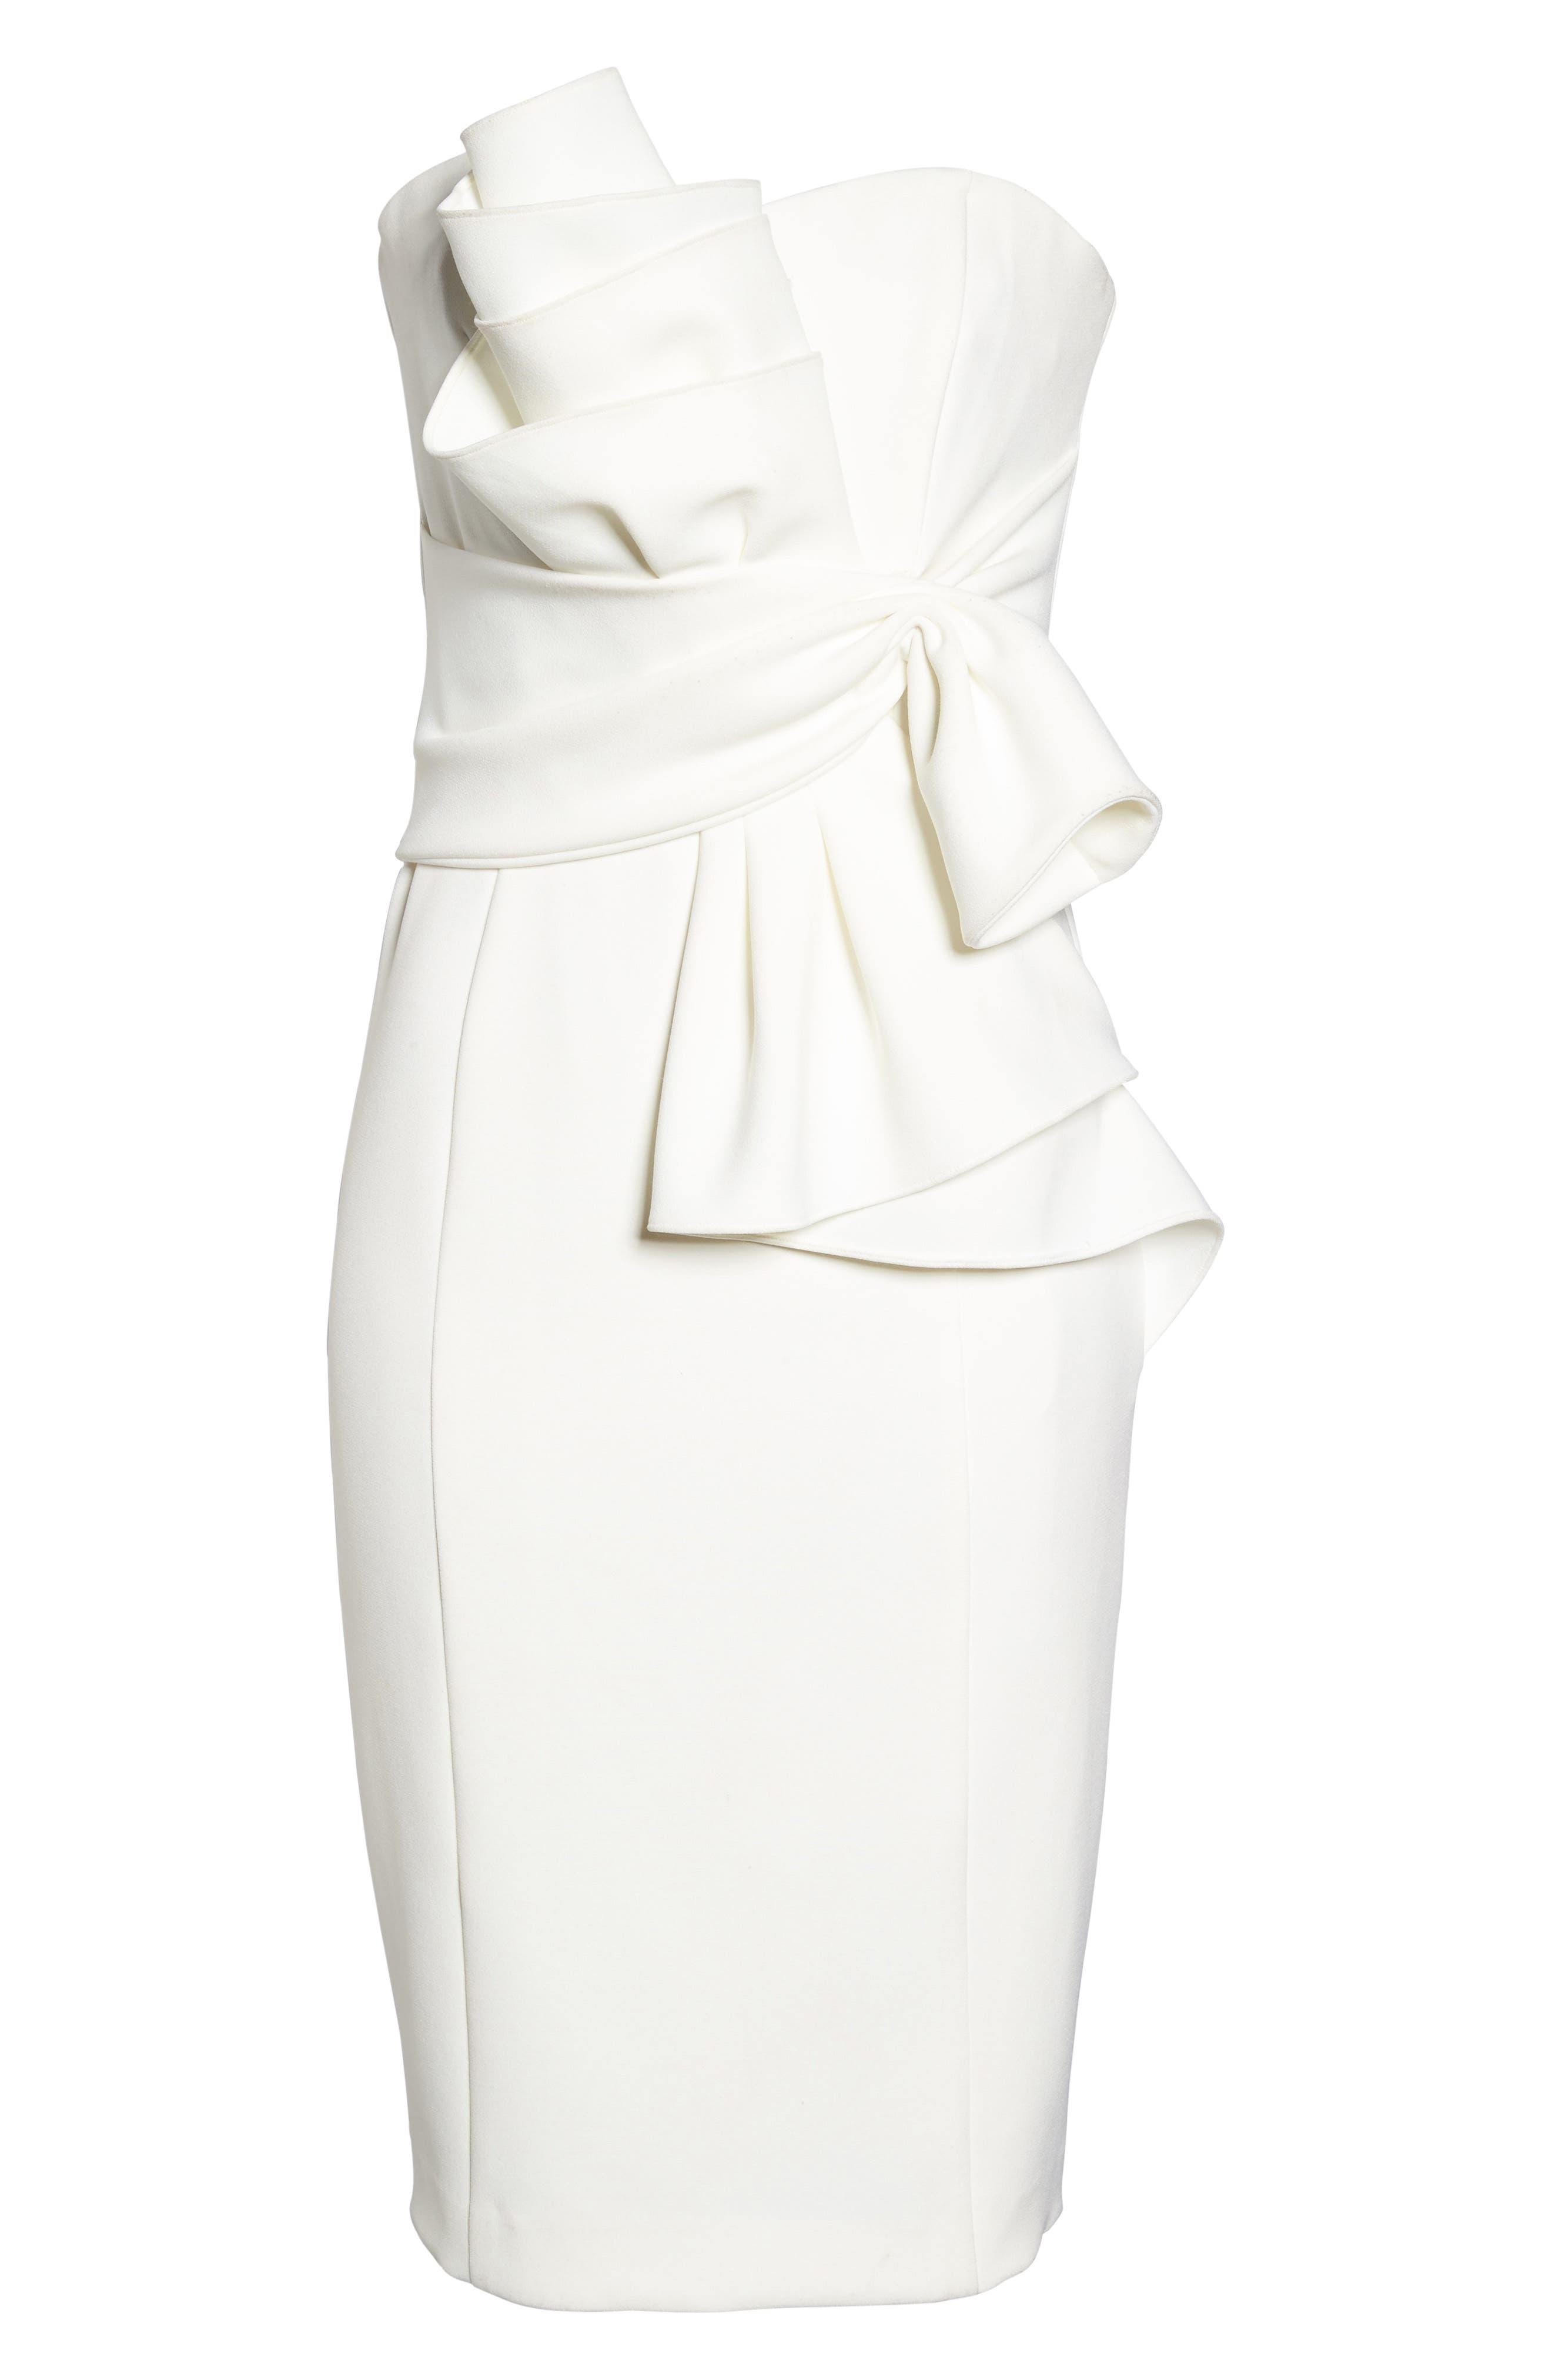 Badgley Mischka Sculpture Flower Cocktail Dress,                             Alternate thumbnail 6, color,                             906